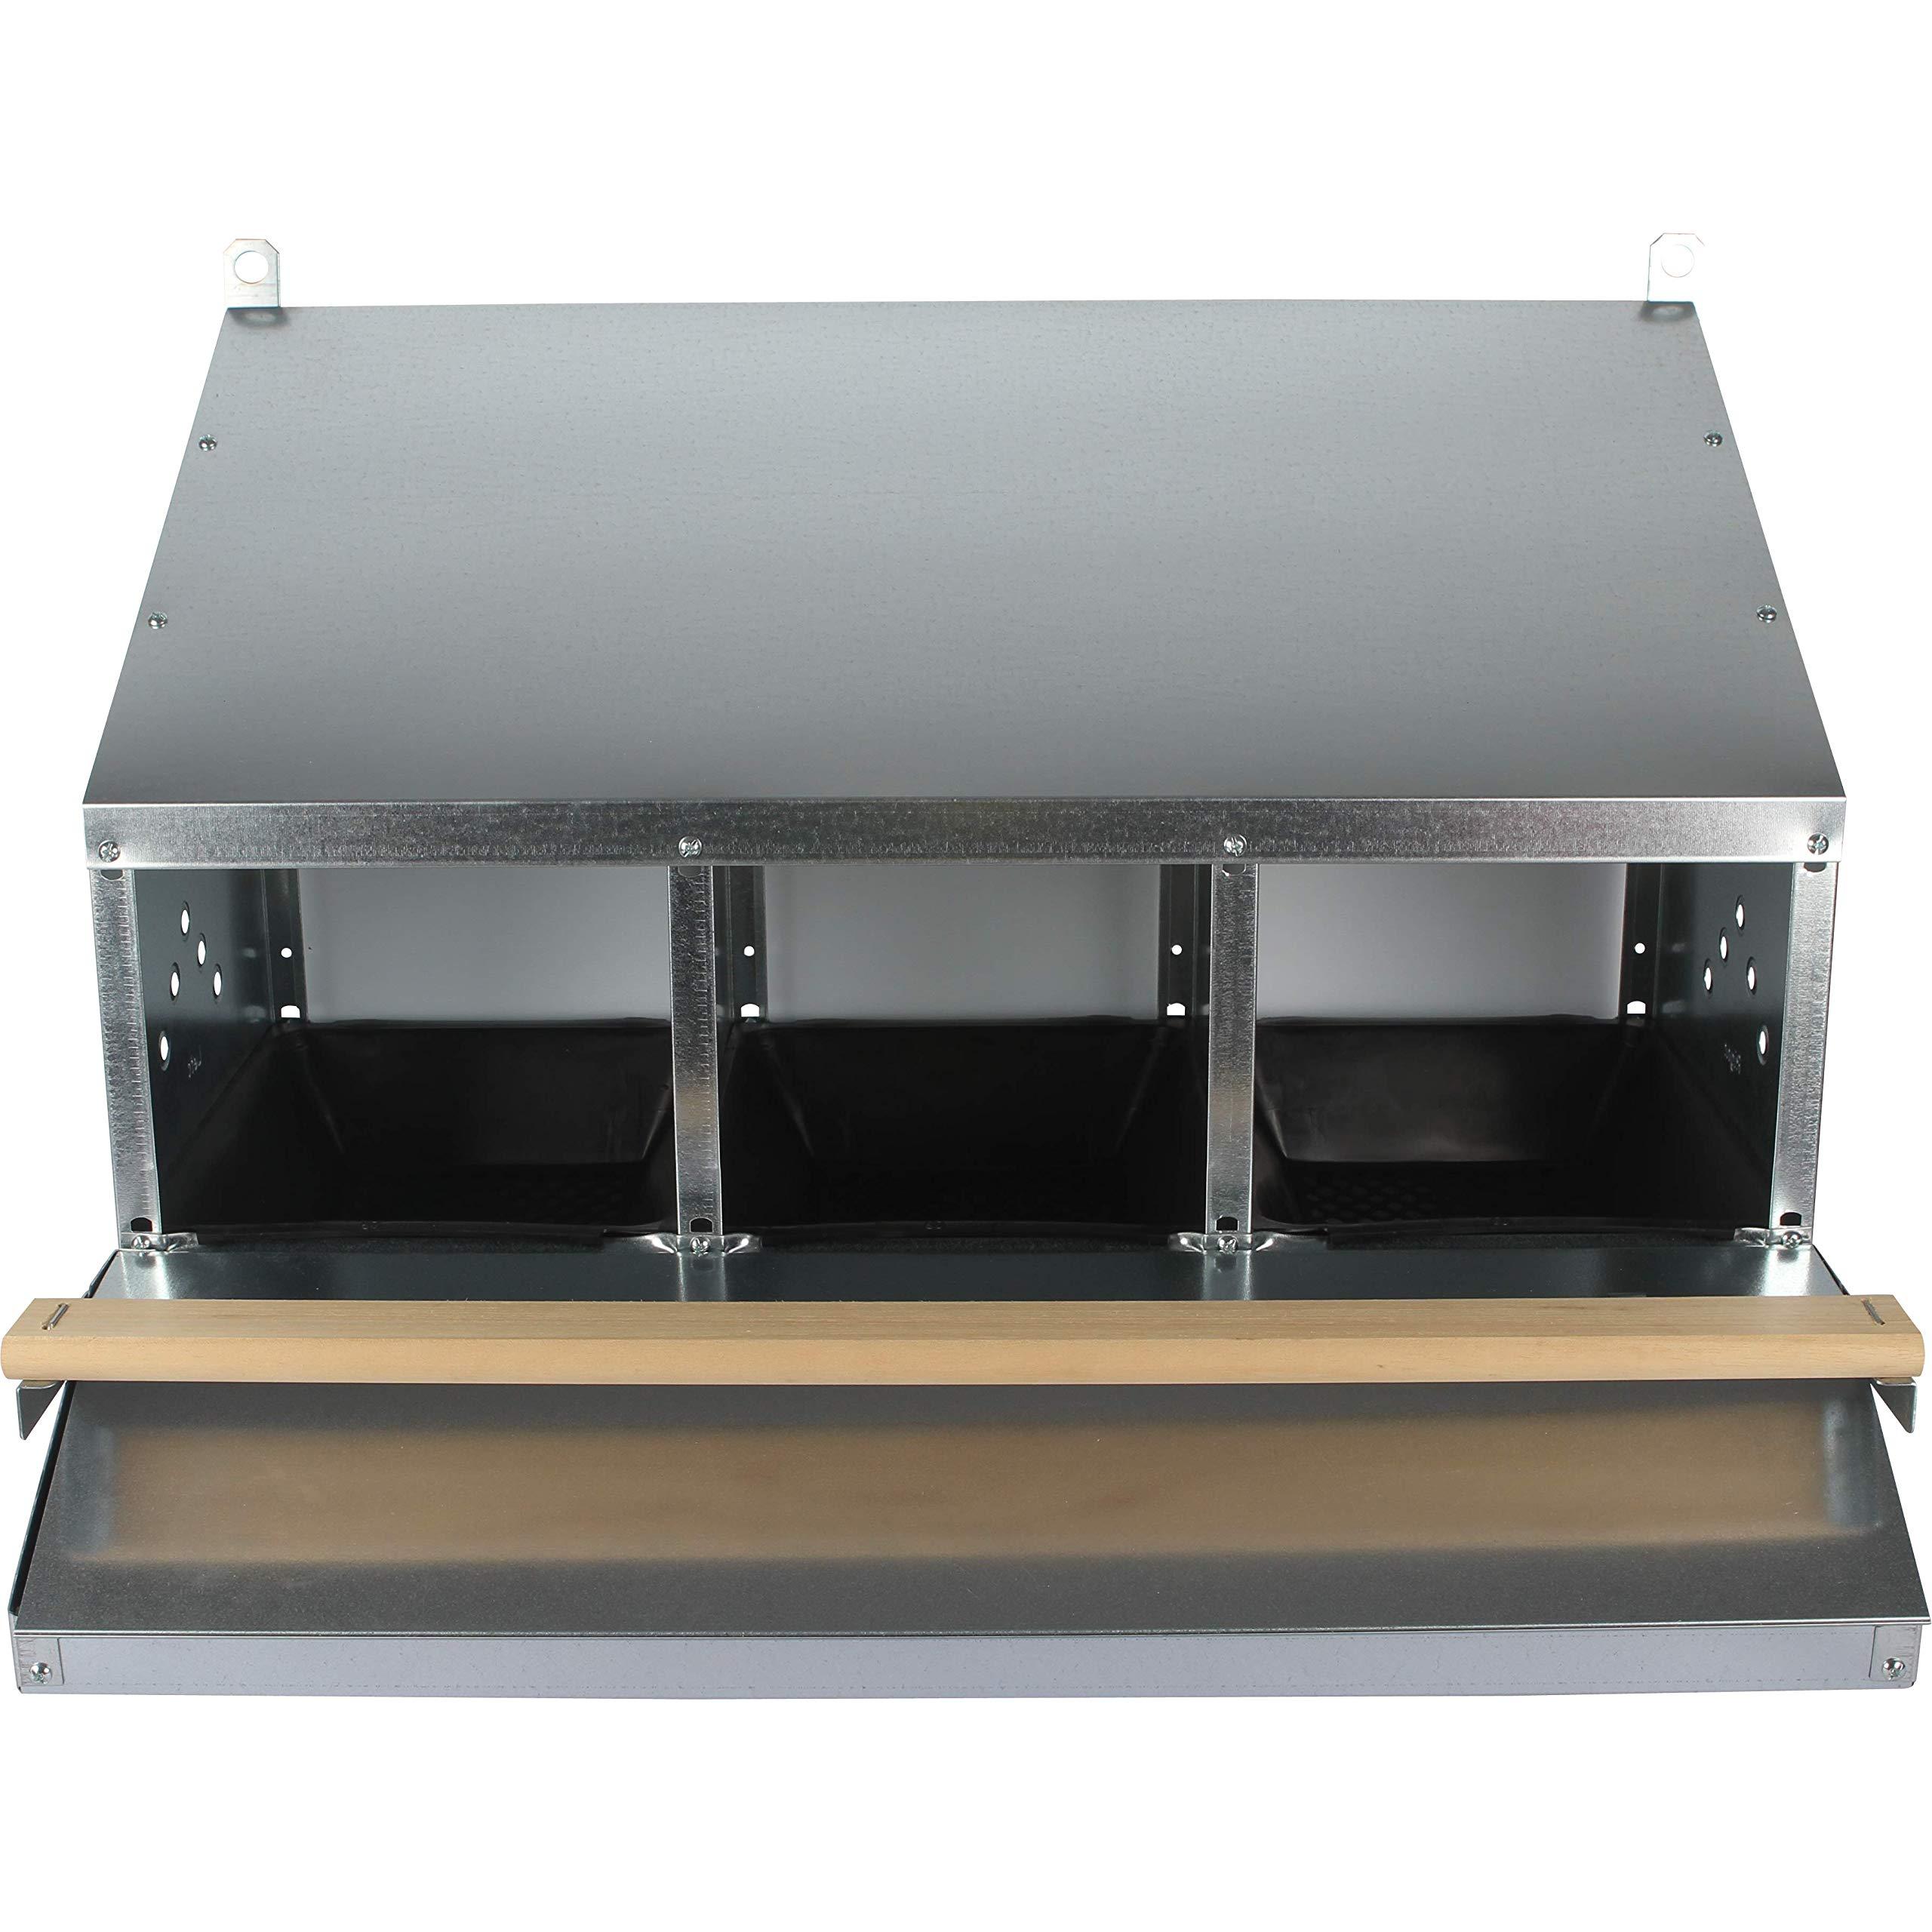 SKA Urban-Egg Roll Away Chicken Nest Box with Foldable Perch & Chute - Zinc-Plated Steel - 3-Hole by SKA